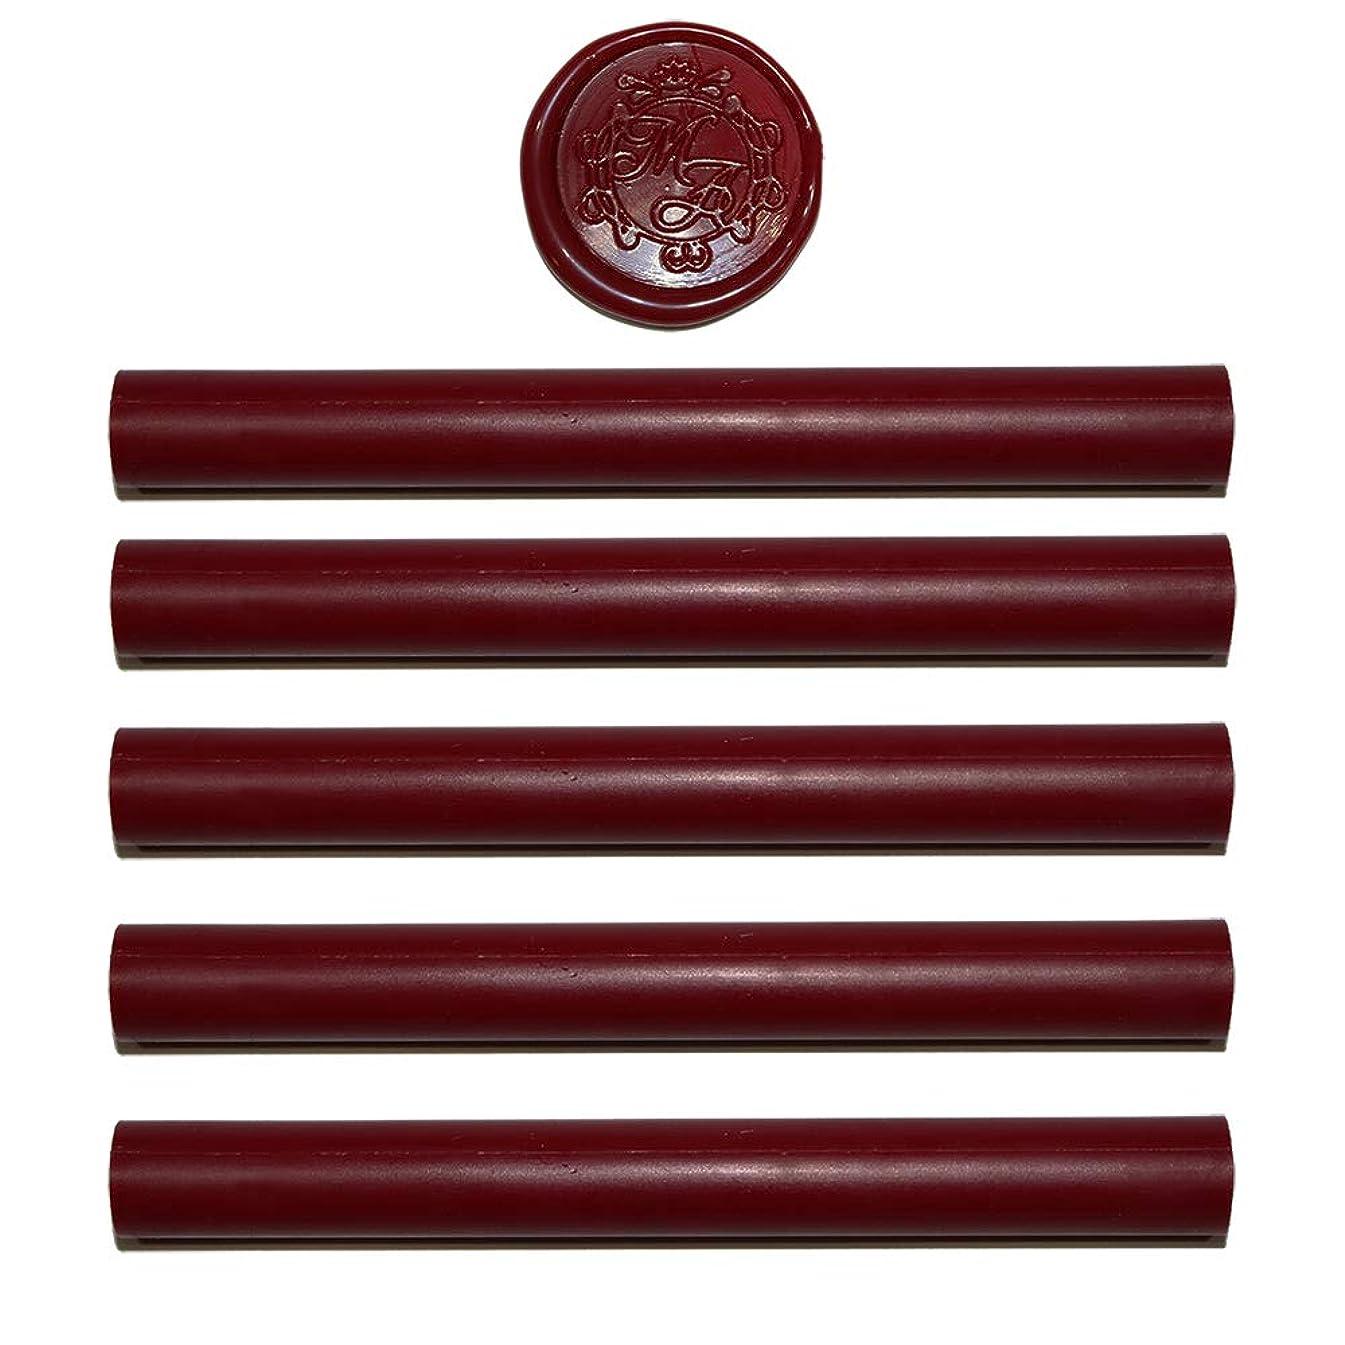 Red Sealing Wax Sticks - 5 Pack Sealing Wax Sticks - Wedding Wax Seals - 100% USA Ingredients (Red)